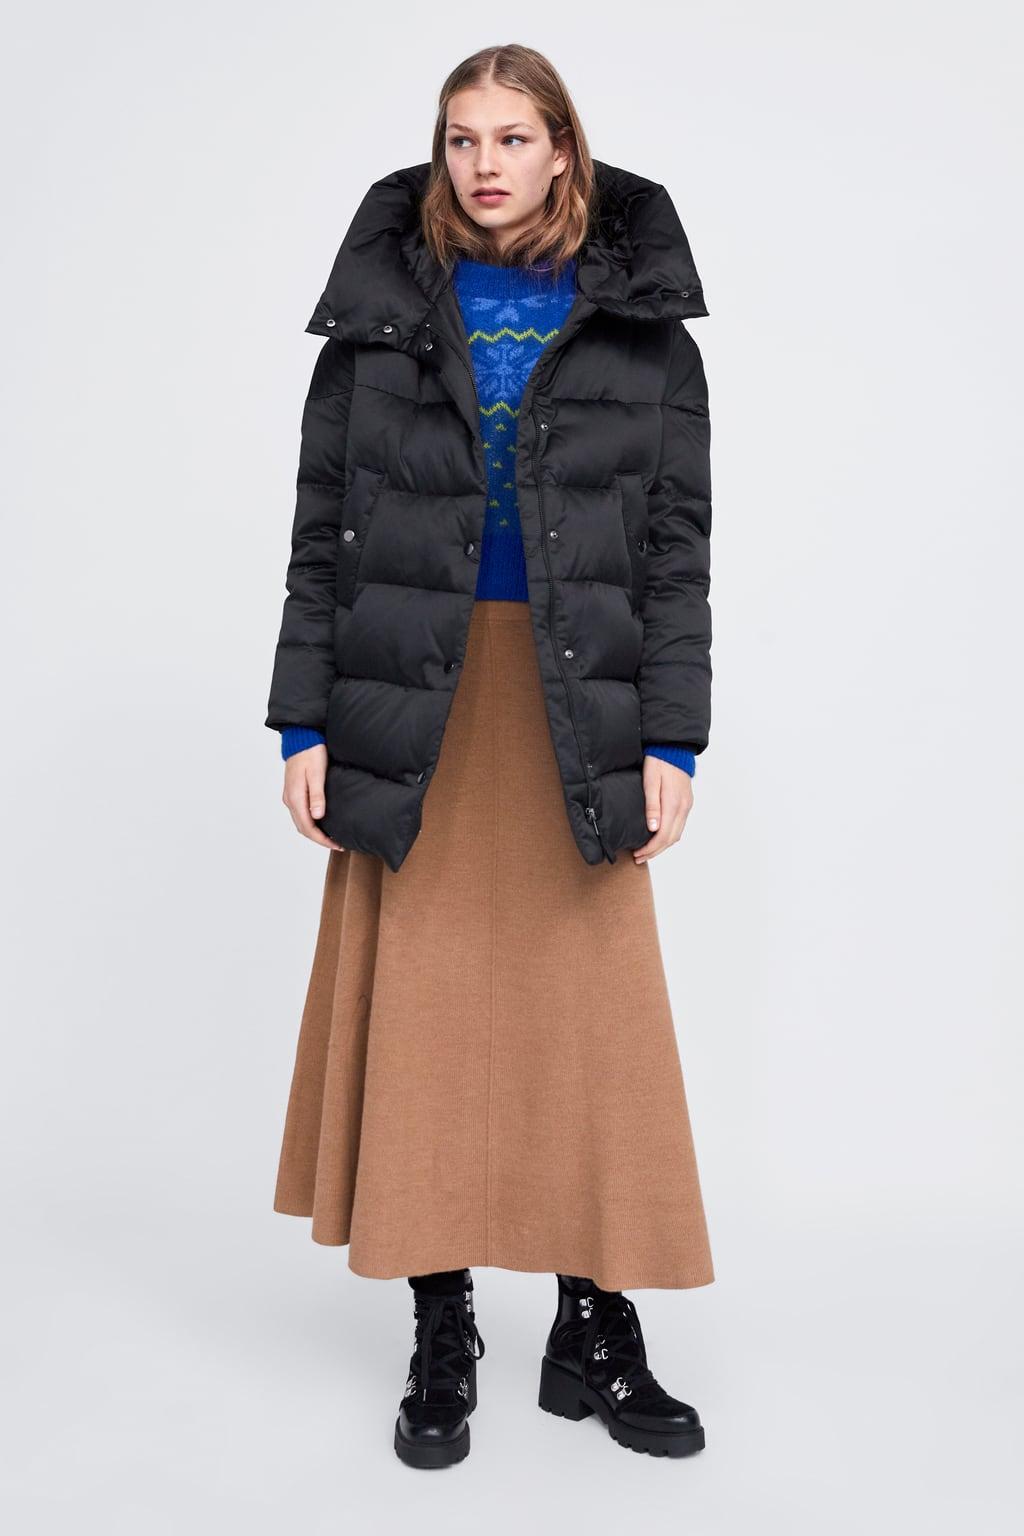 Hooded Down Puffer Coat  Down Filled Coats Woman by Zara